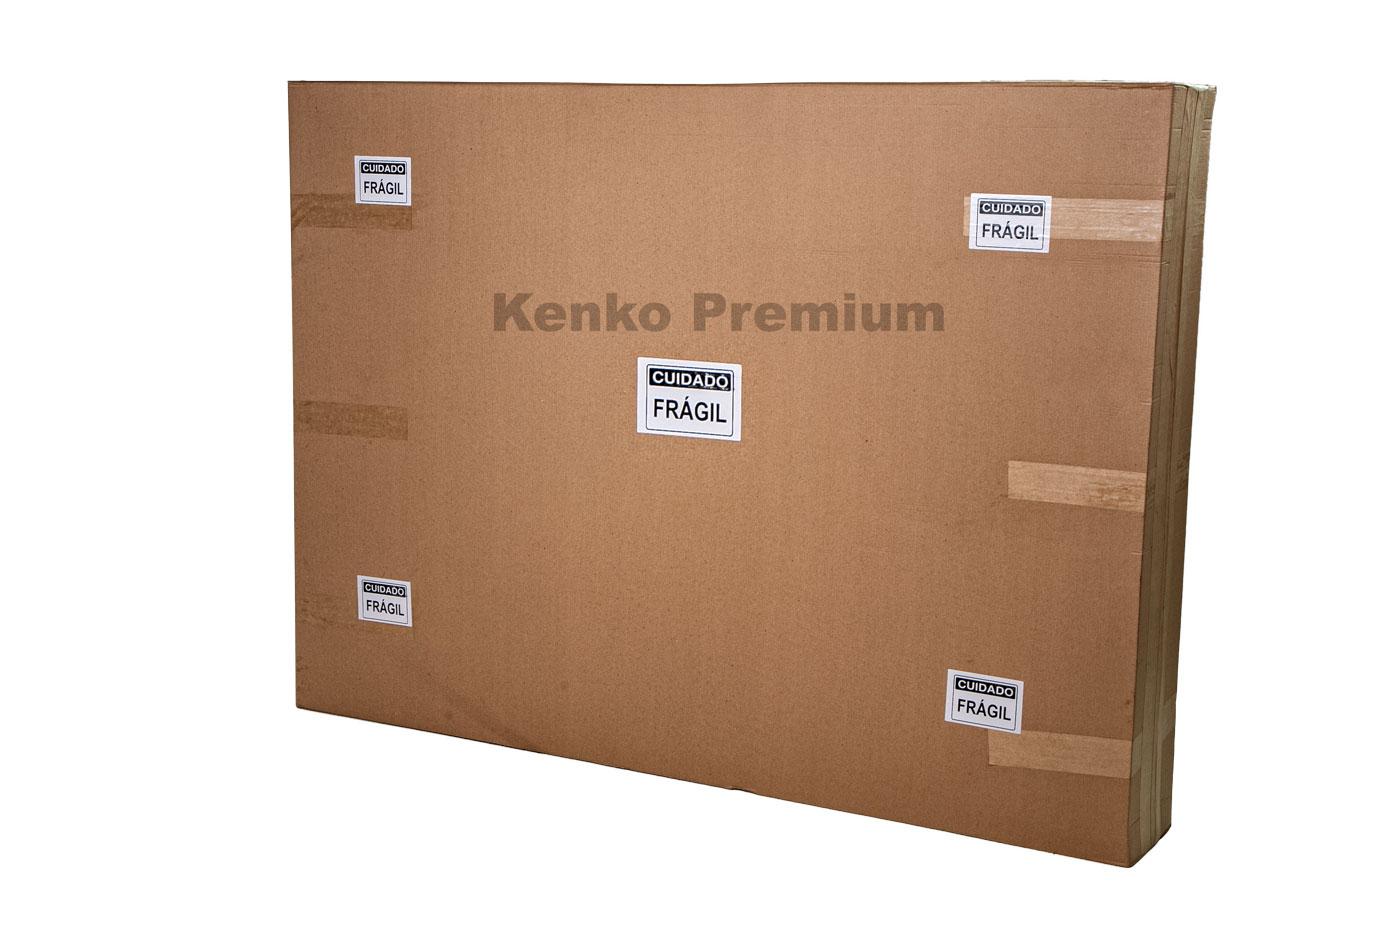 Colchão Magnético Kenko Premium Casal 1,38x1,88x27cm Plus C/ Massagem Eletrônica  Energia Bioquãntica + Cromoterapia  - Kenko Premium Colchões